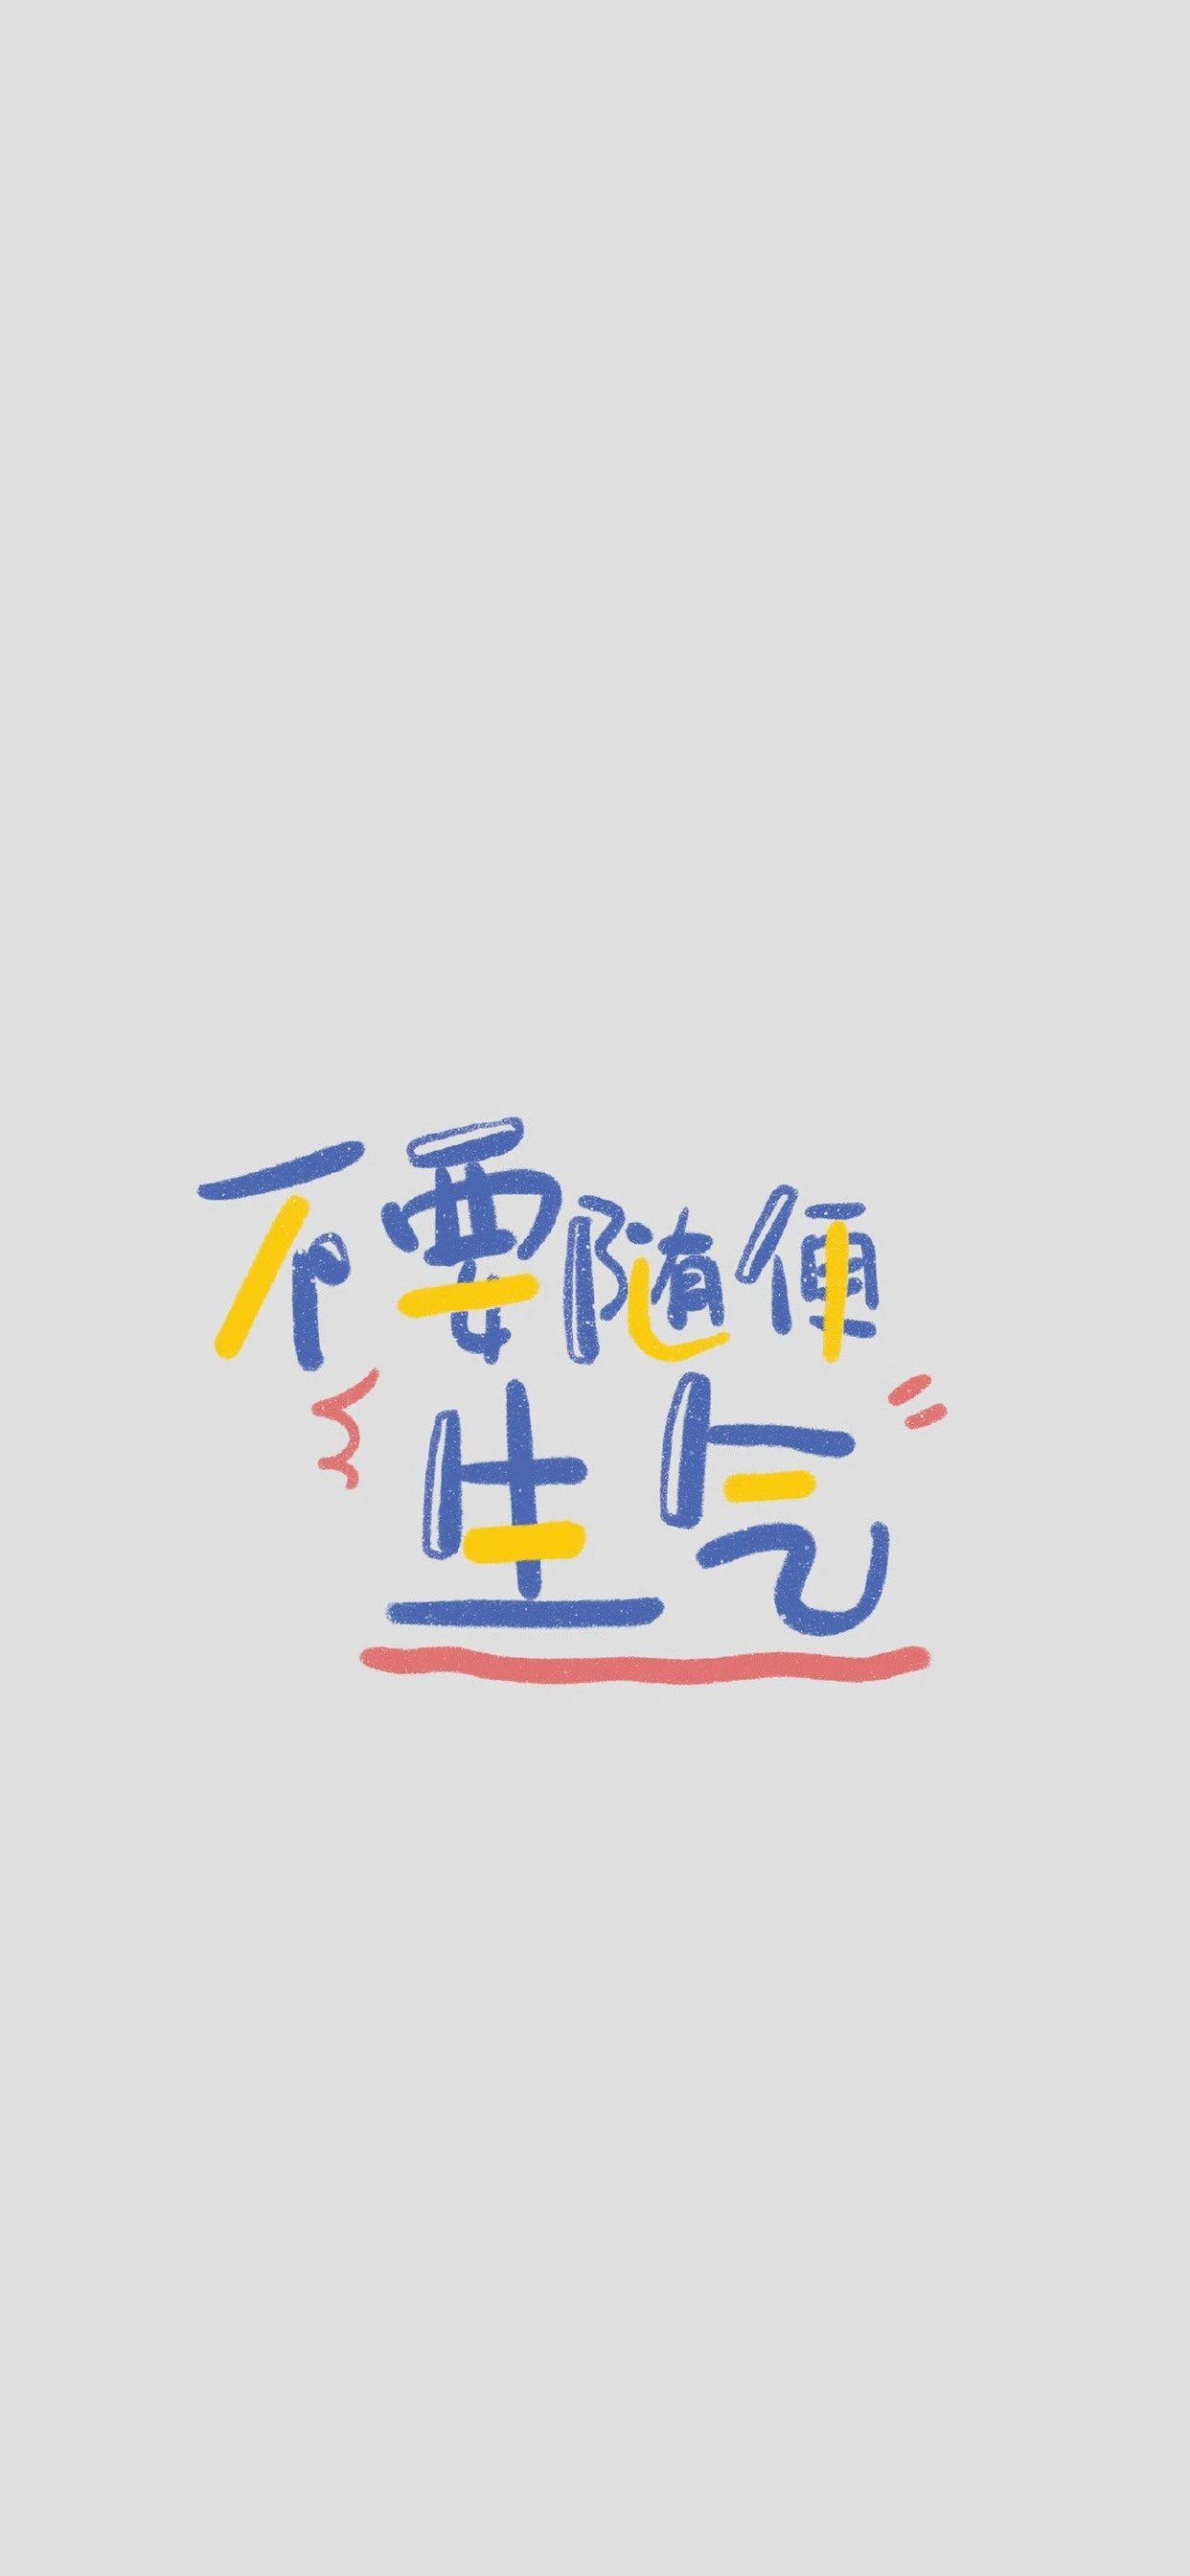 5e5d47539932c - 精选壁纸:正能量 小清新 文字!